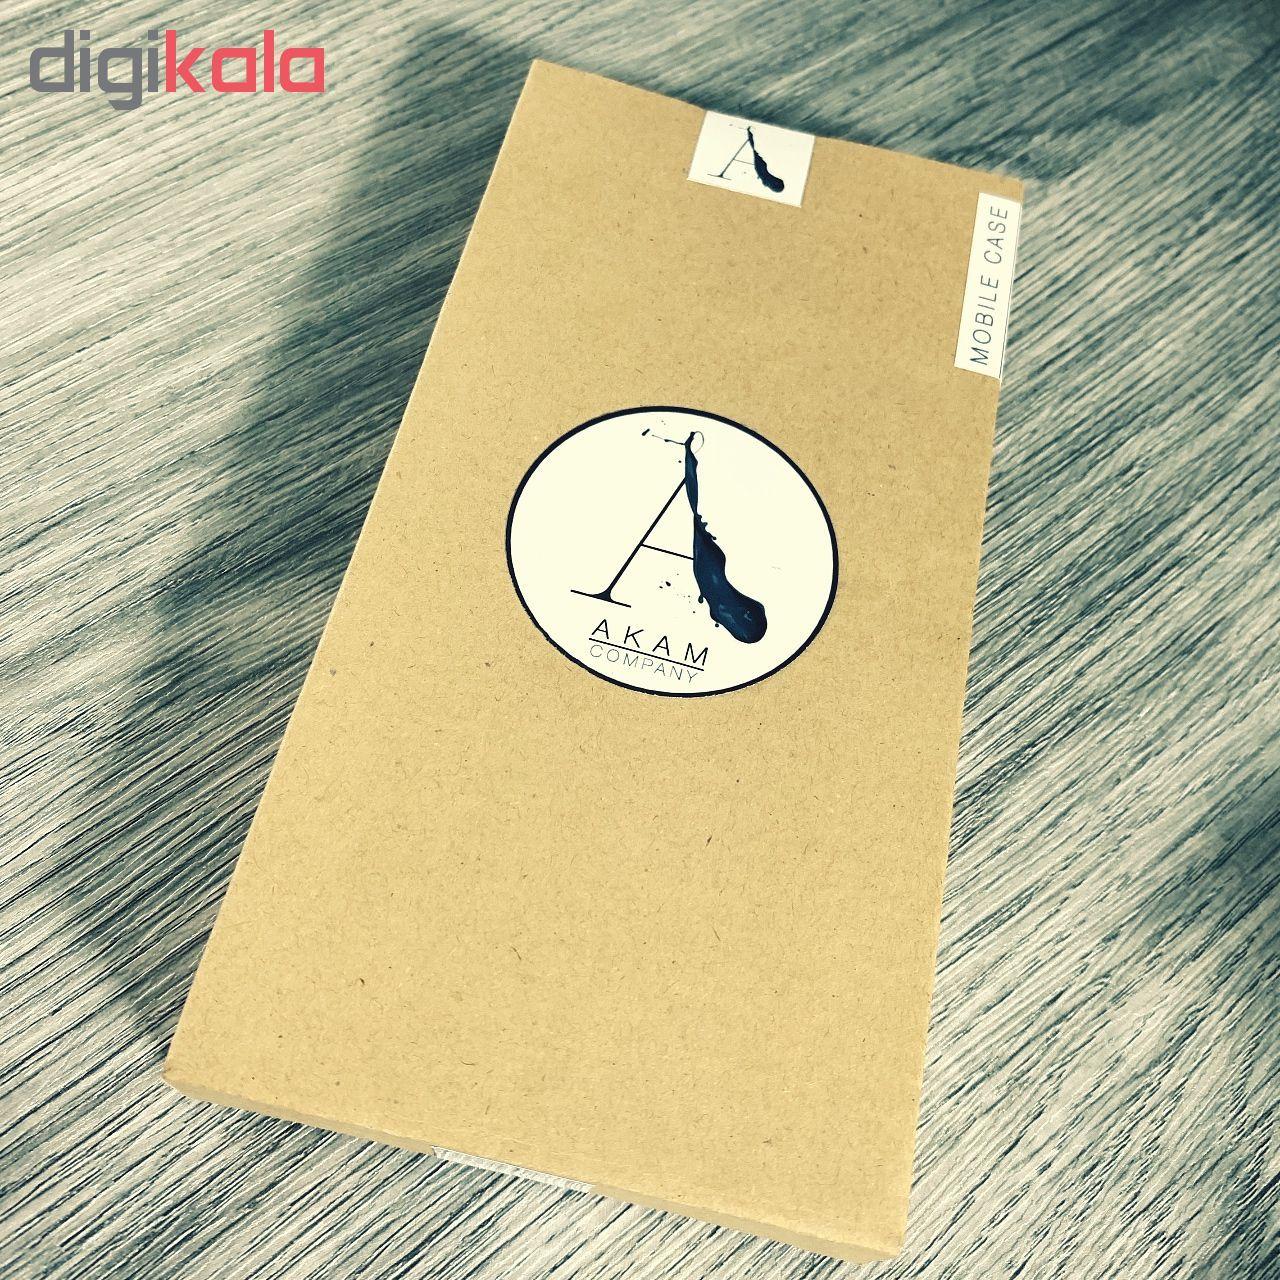 کاور آکام مدل Aa201581 مناسب برای گوشی موبایل سامسونگ Galaxy A20/A30